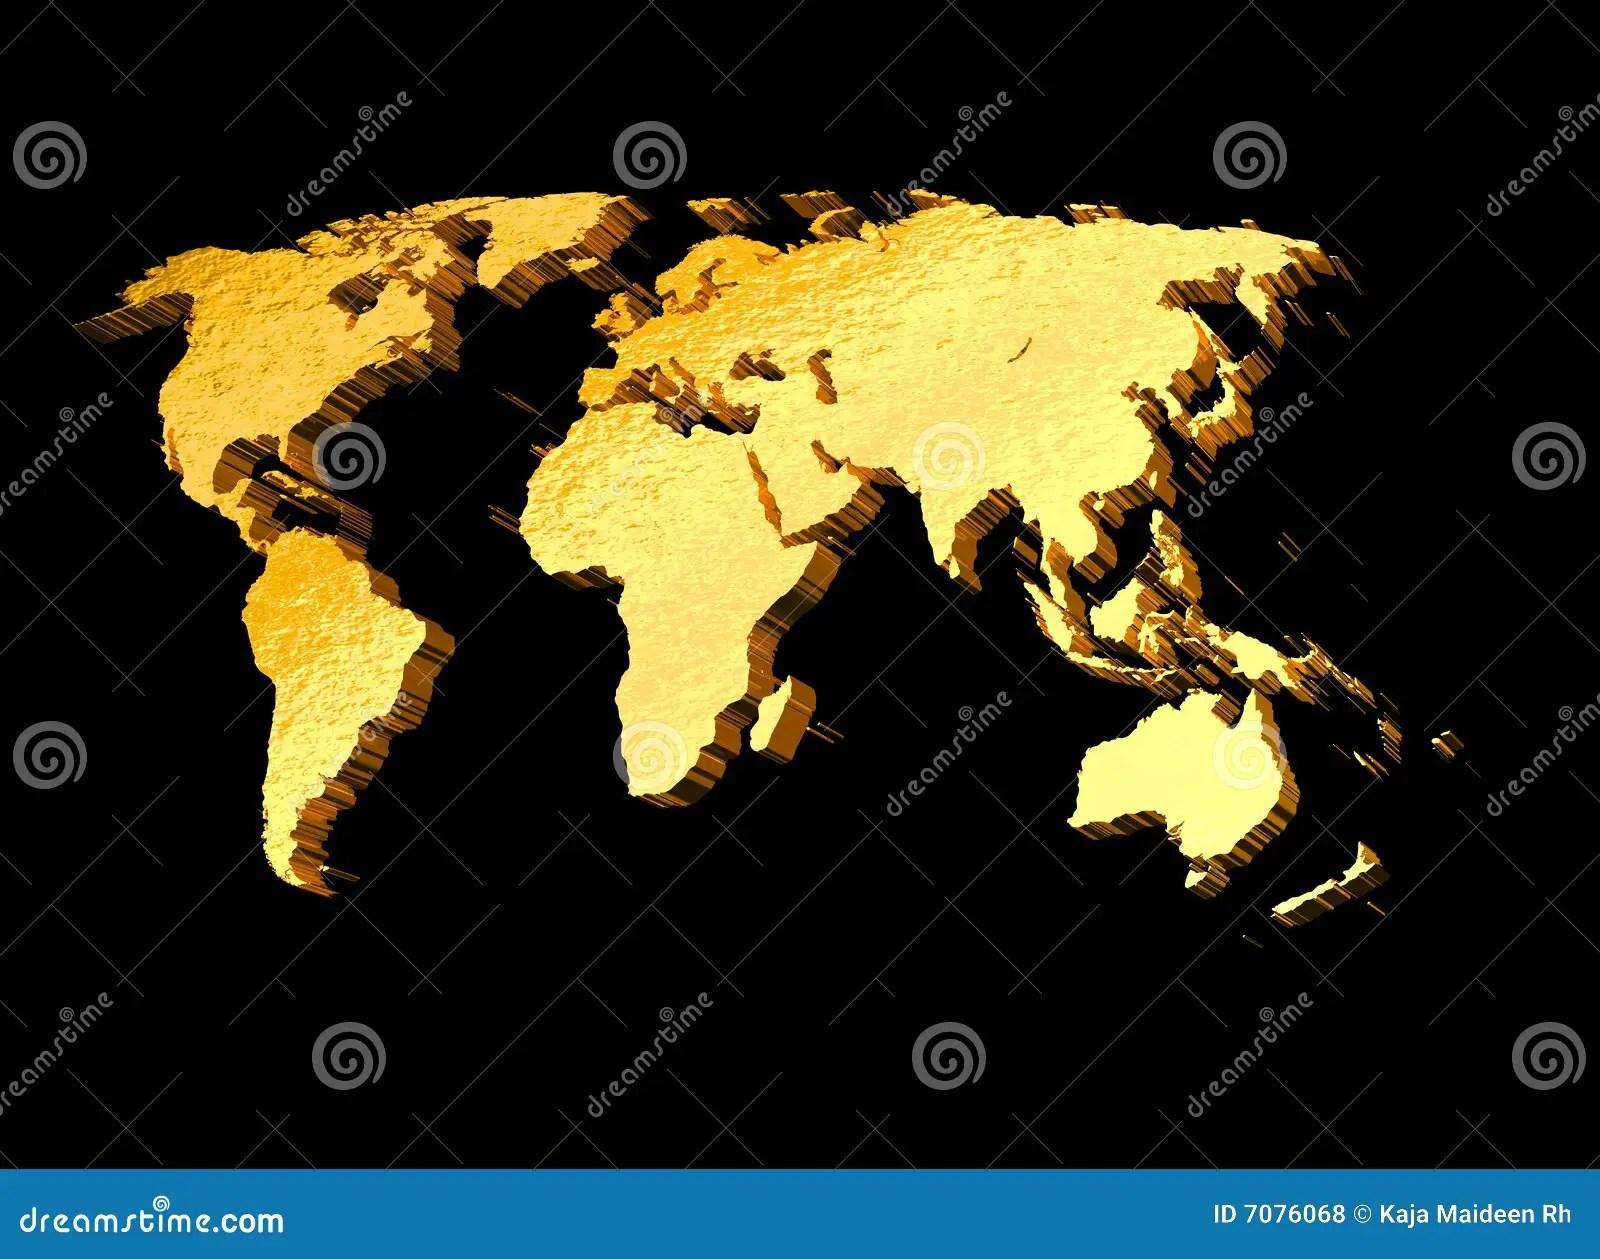 Africa Map 3d Wallpaper 3d Gold World Map Stock Illustration Image Of Australia